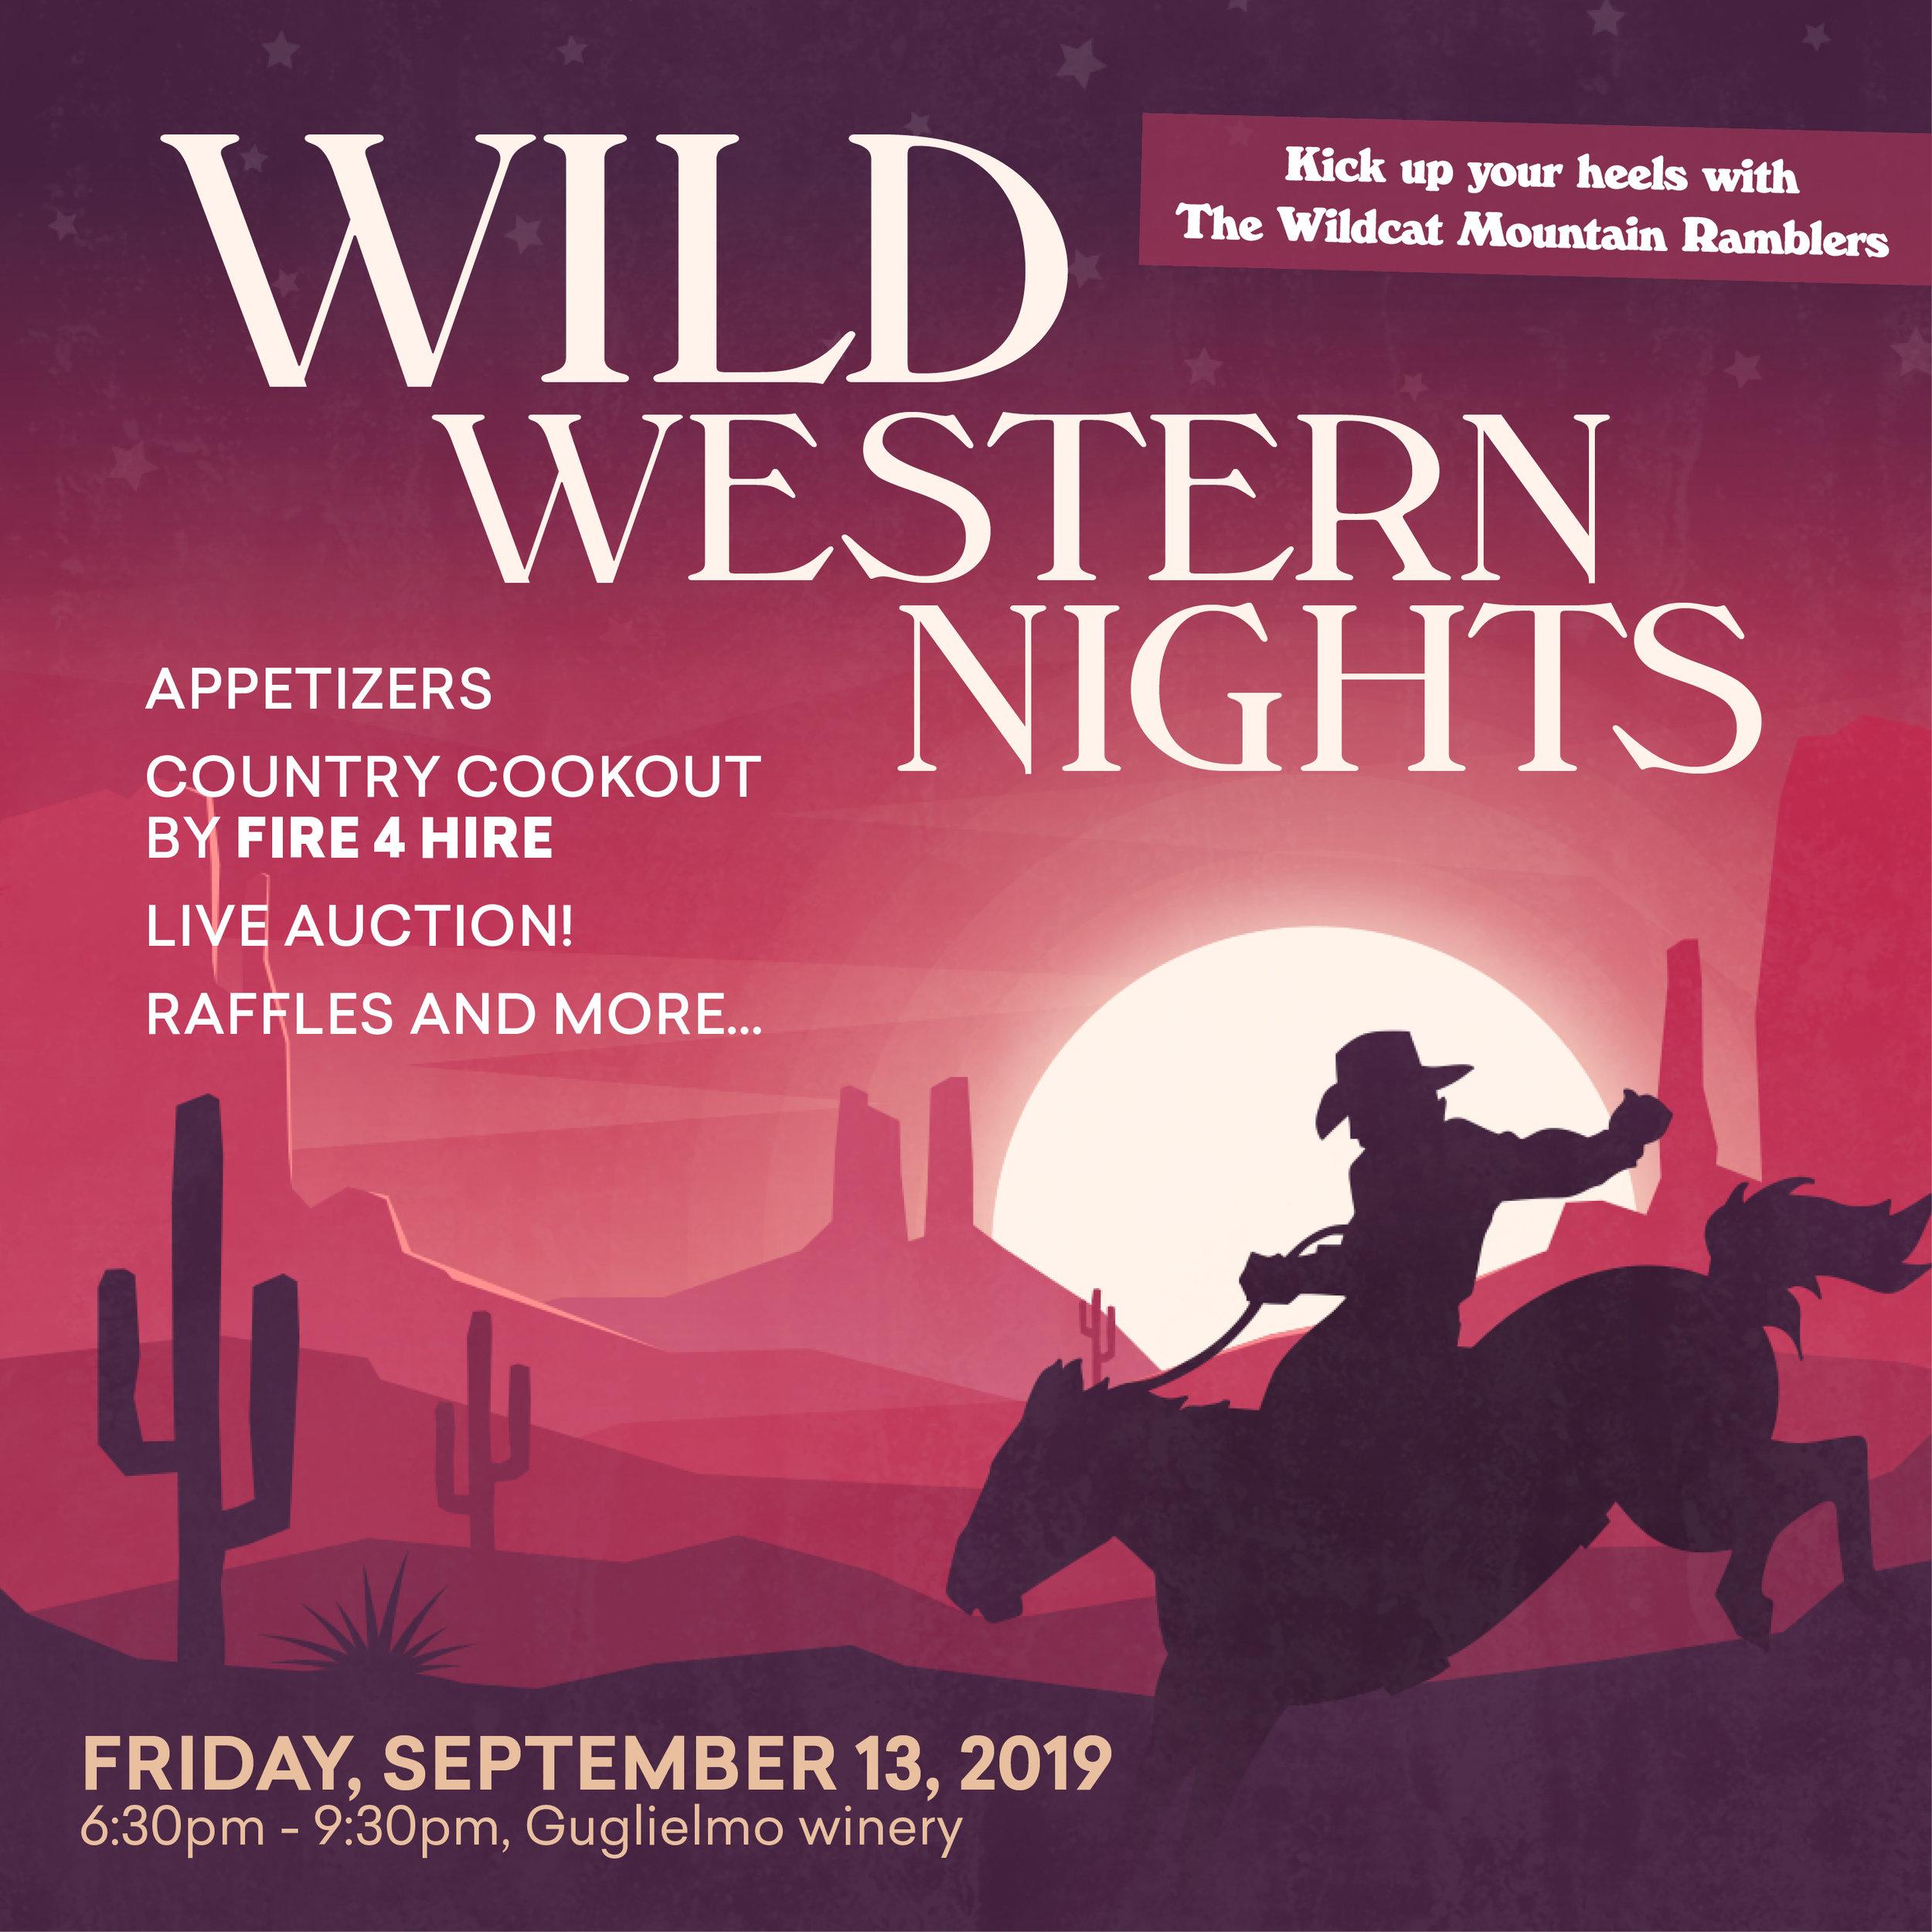 Wild Western Nights Square.jpg